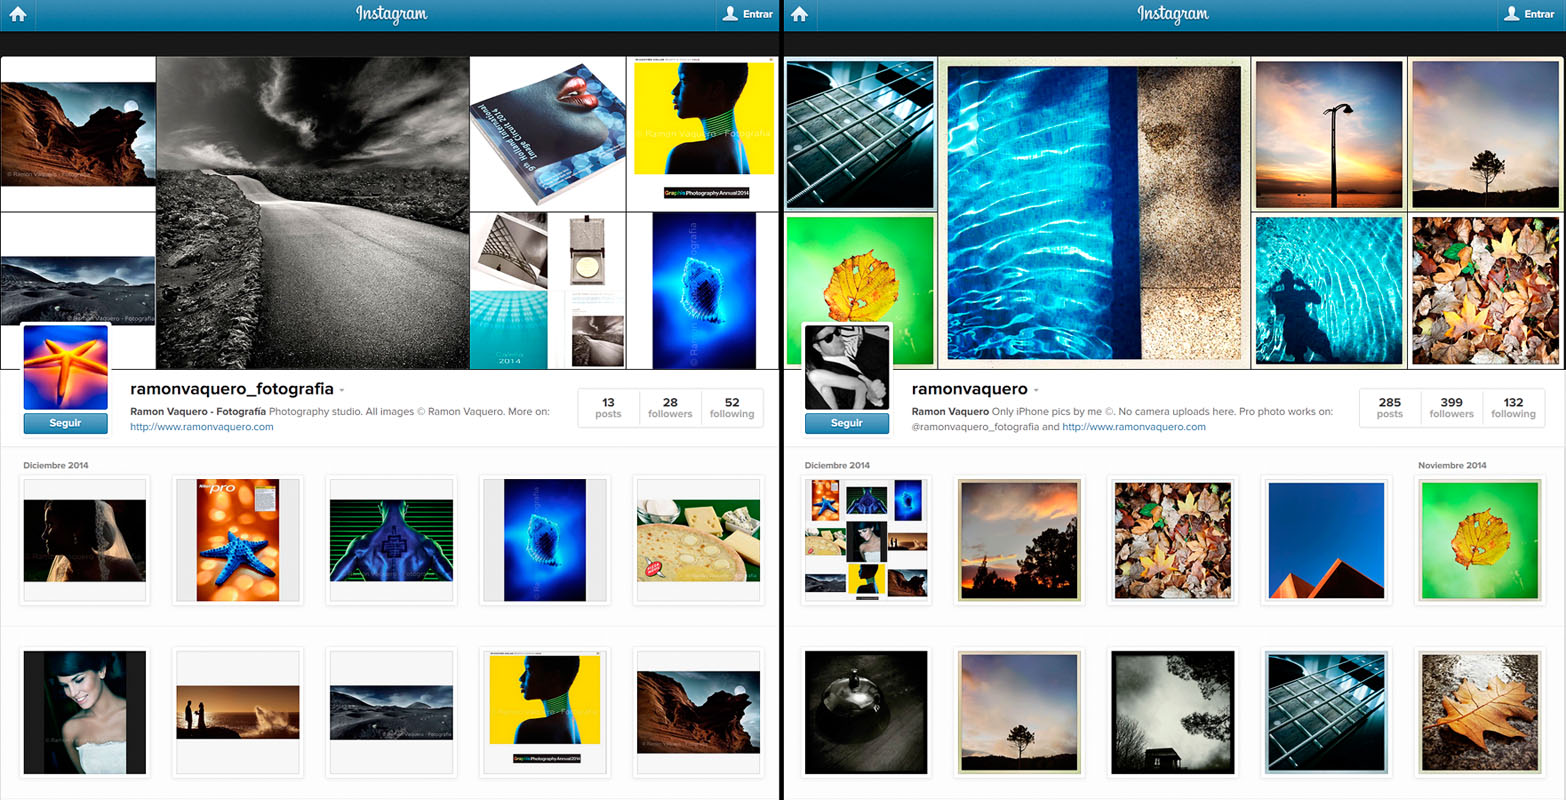 Ramon Vaquero- instagram-fotografos vigo